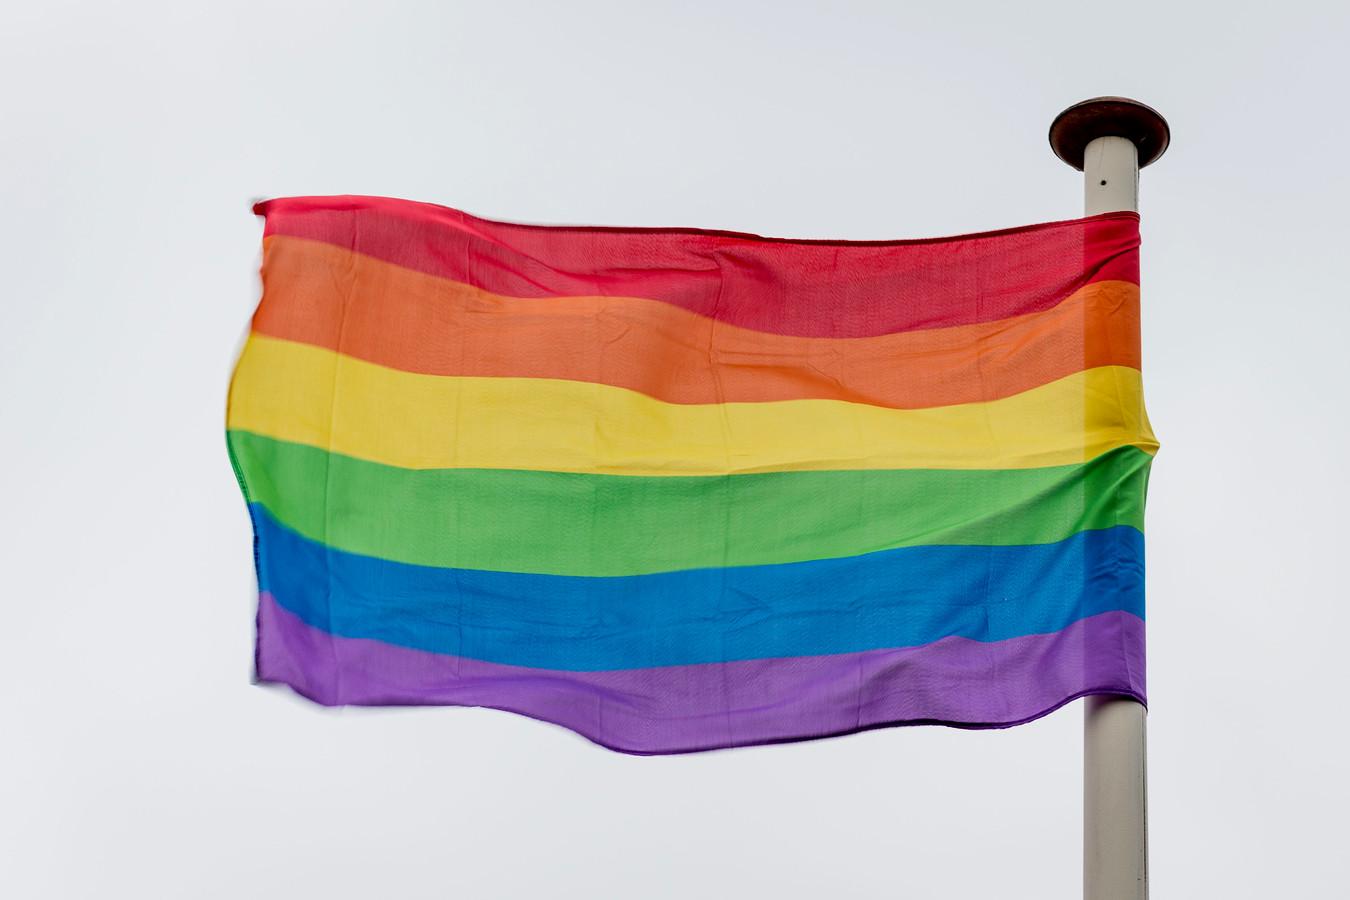 De regenboogvlag.